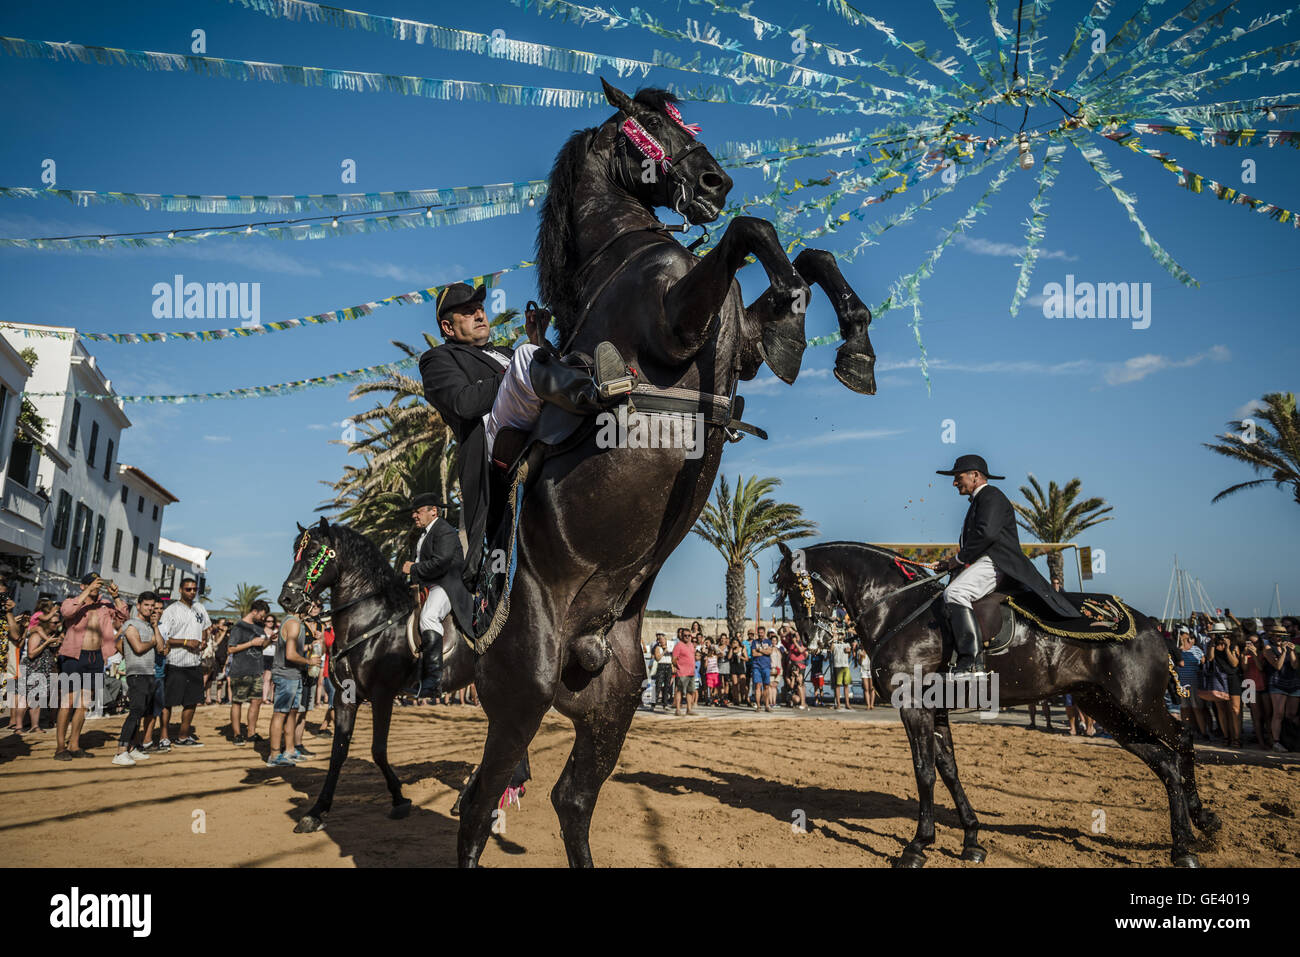 Fornells, Balearic Islands. 23rd July, 2016. Menorca, Spain - A ...